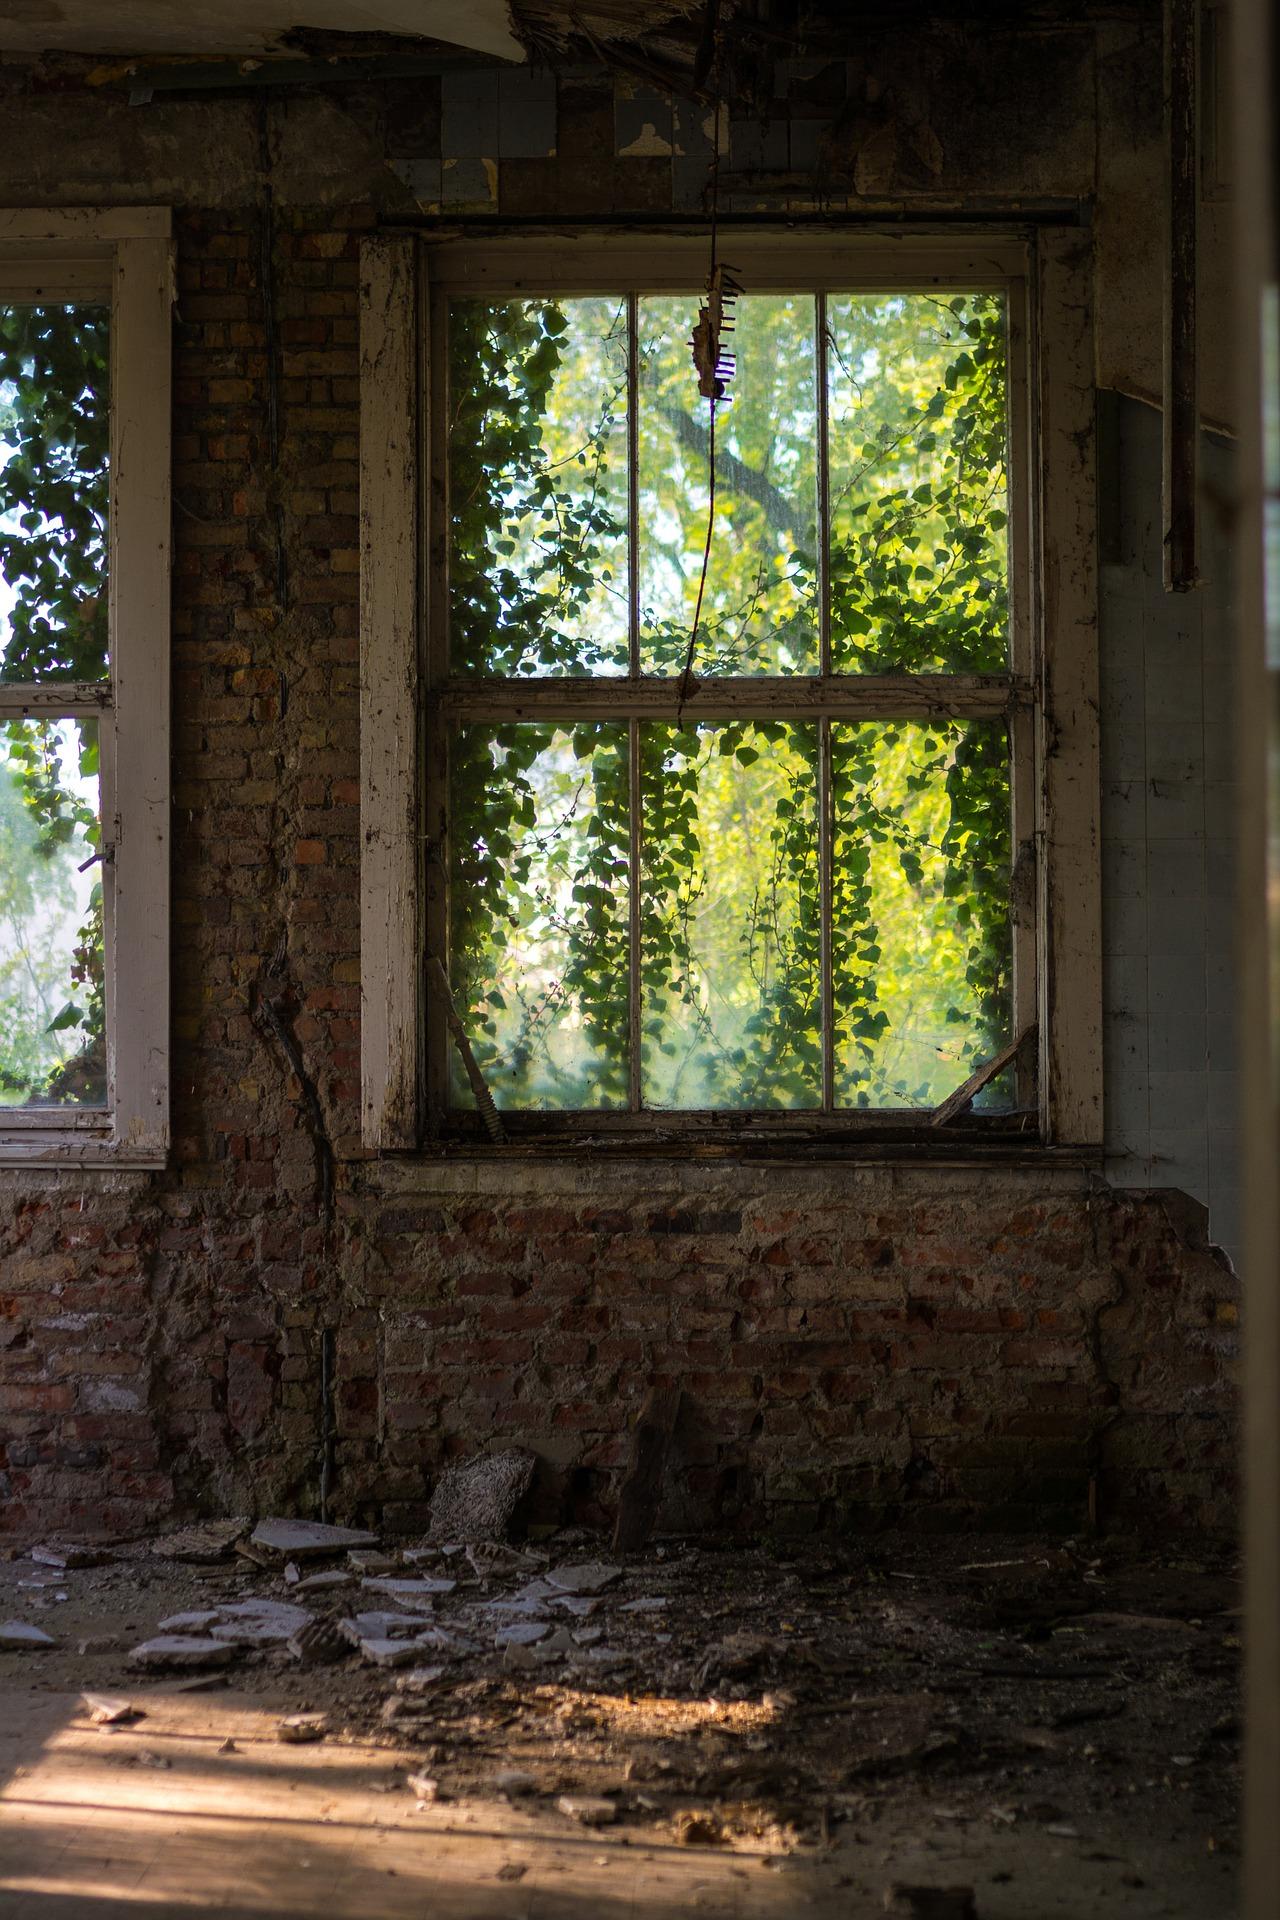 window-1501369_1920